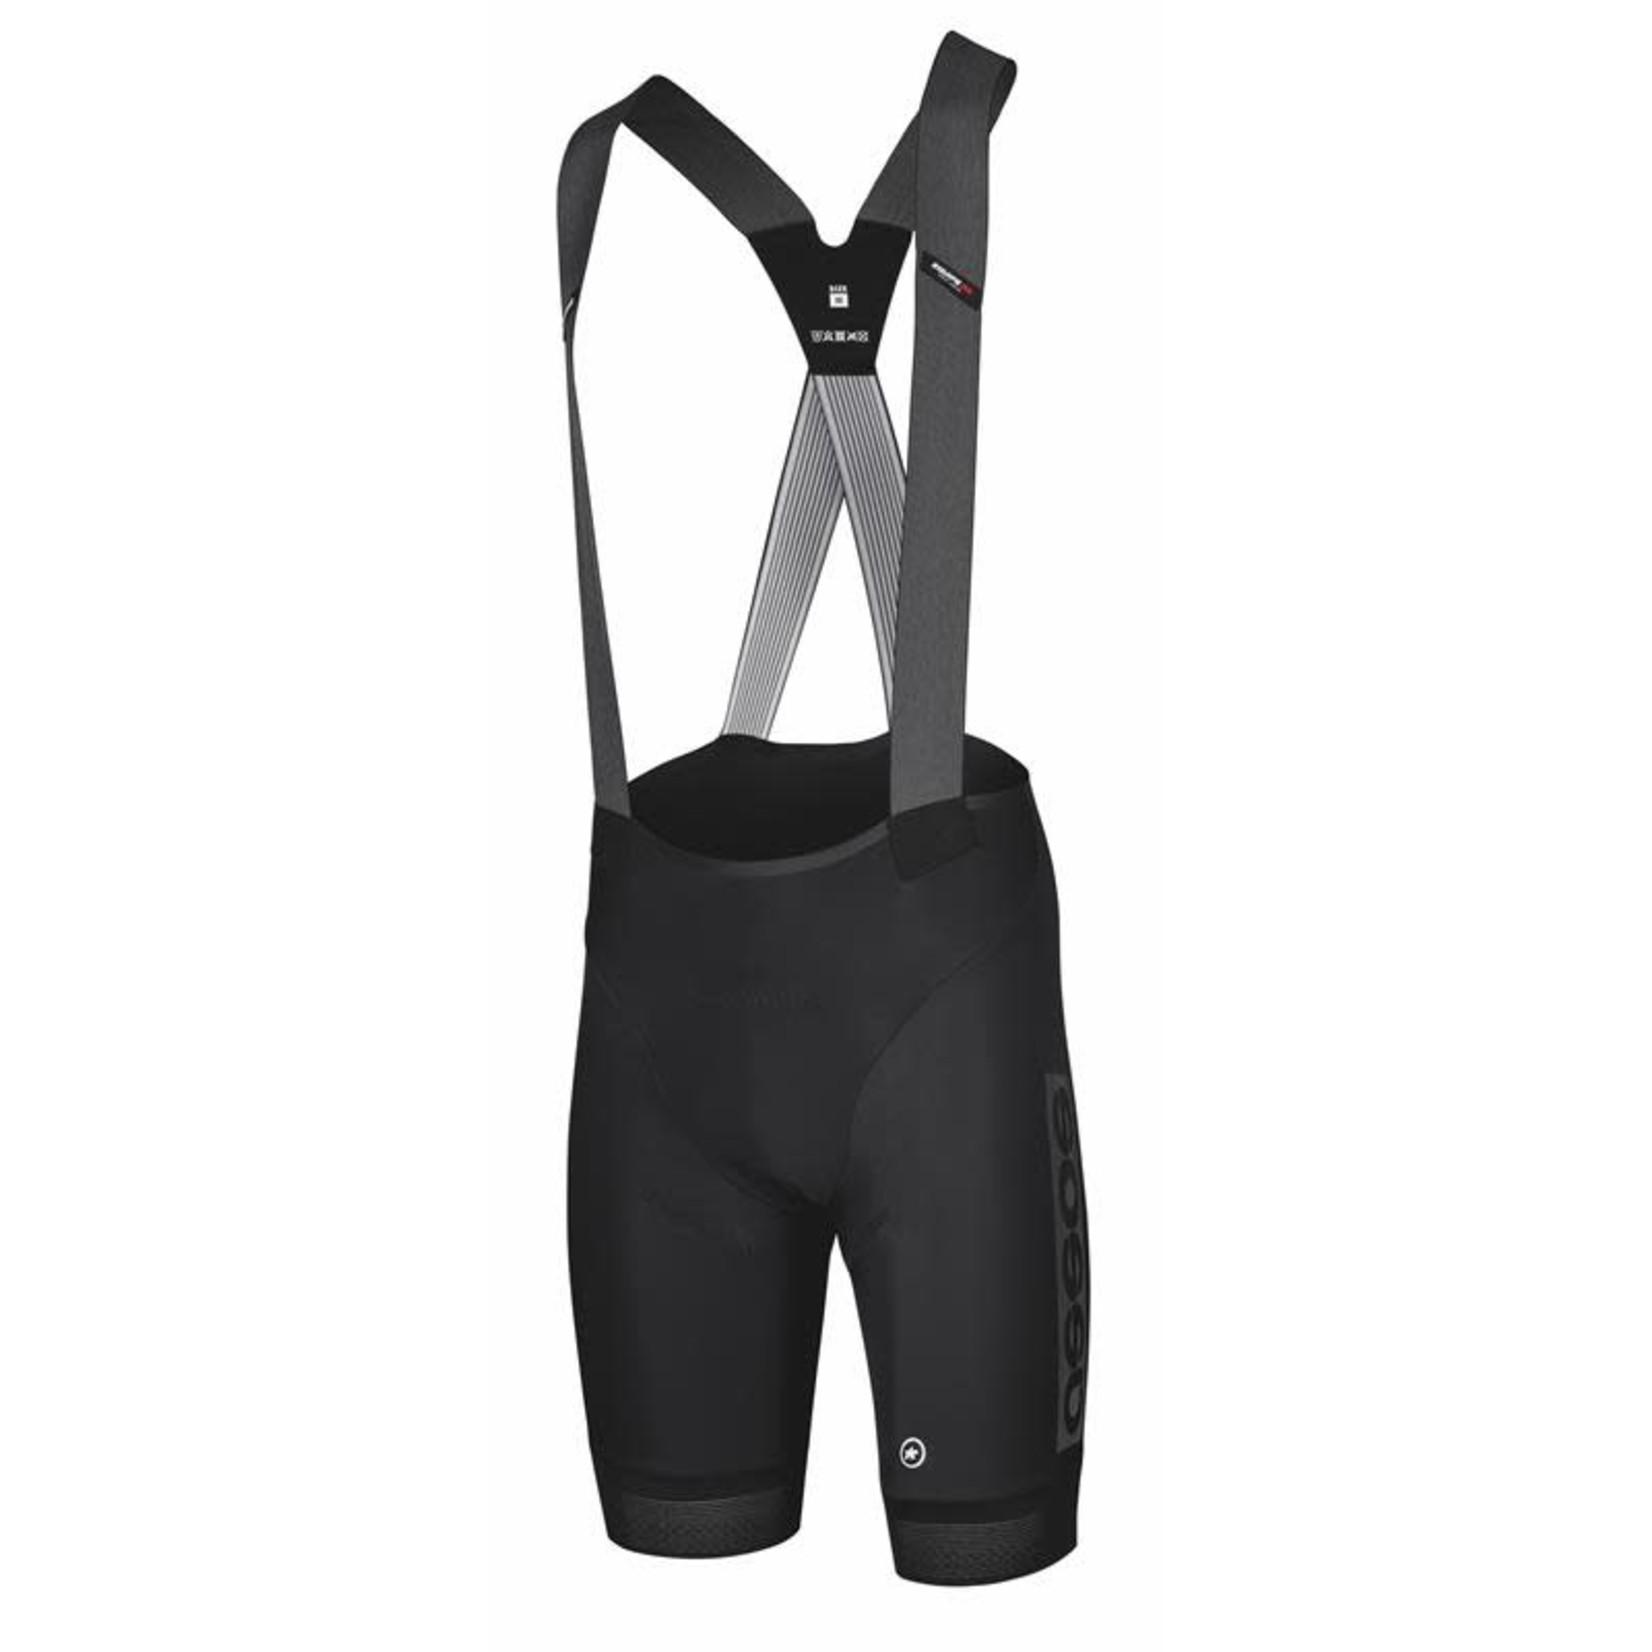 Assos Assos T Werksteam Equipe RS Bib Shorts Men's